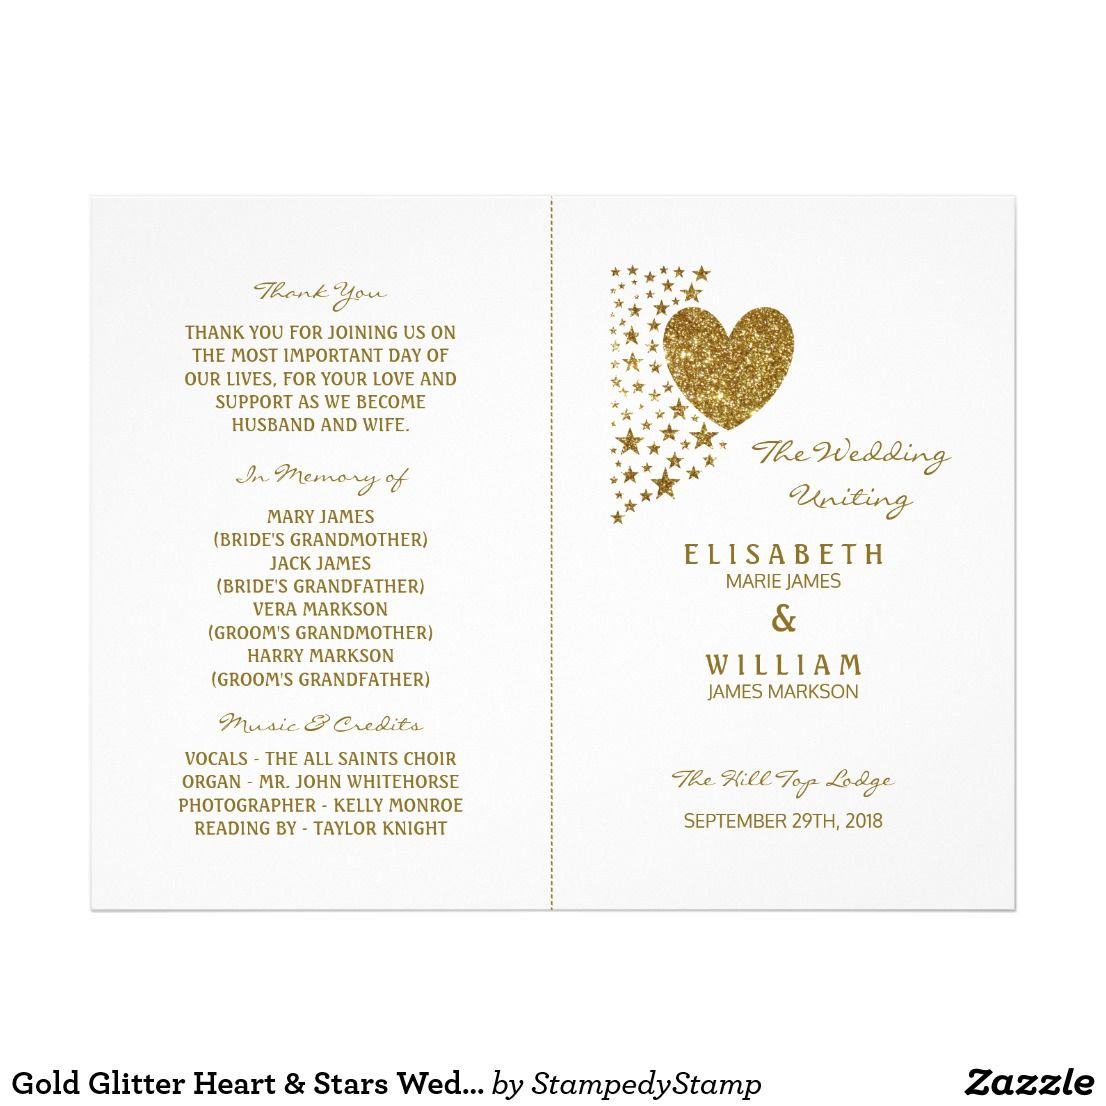 Wedding venue decorations ideas november 2018 Gold Glitter Heart u Stars Wedding Bifold Program Flyer  Wedding